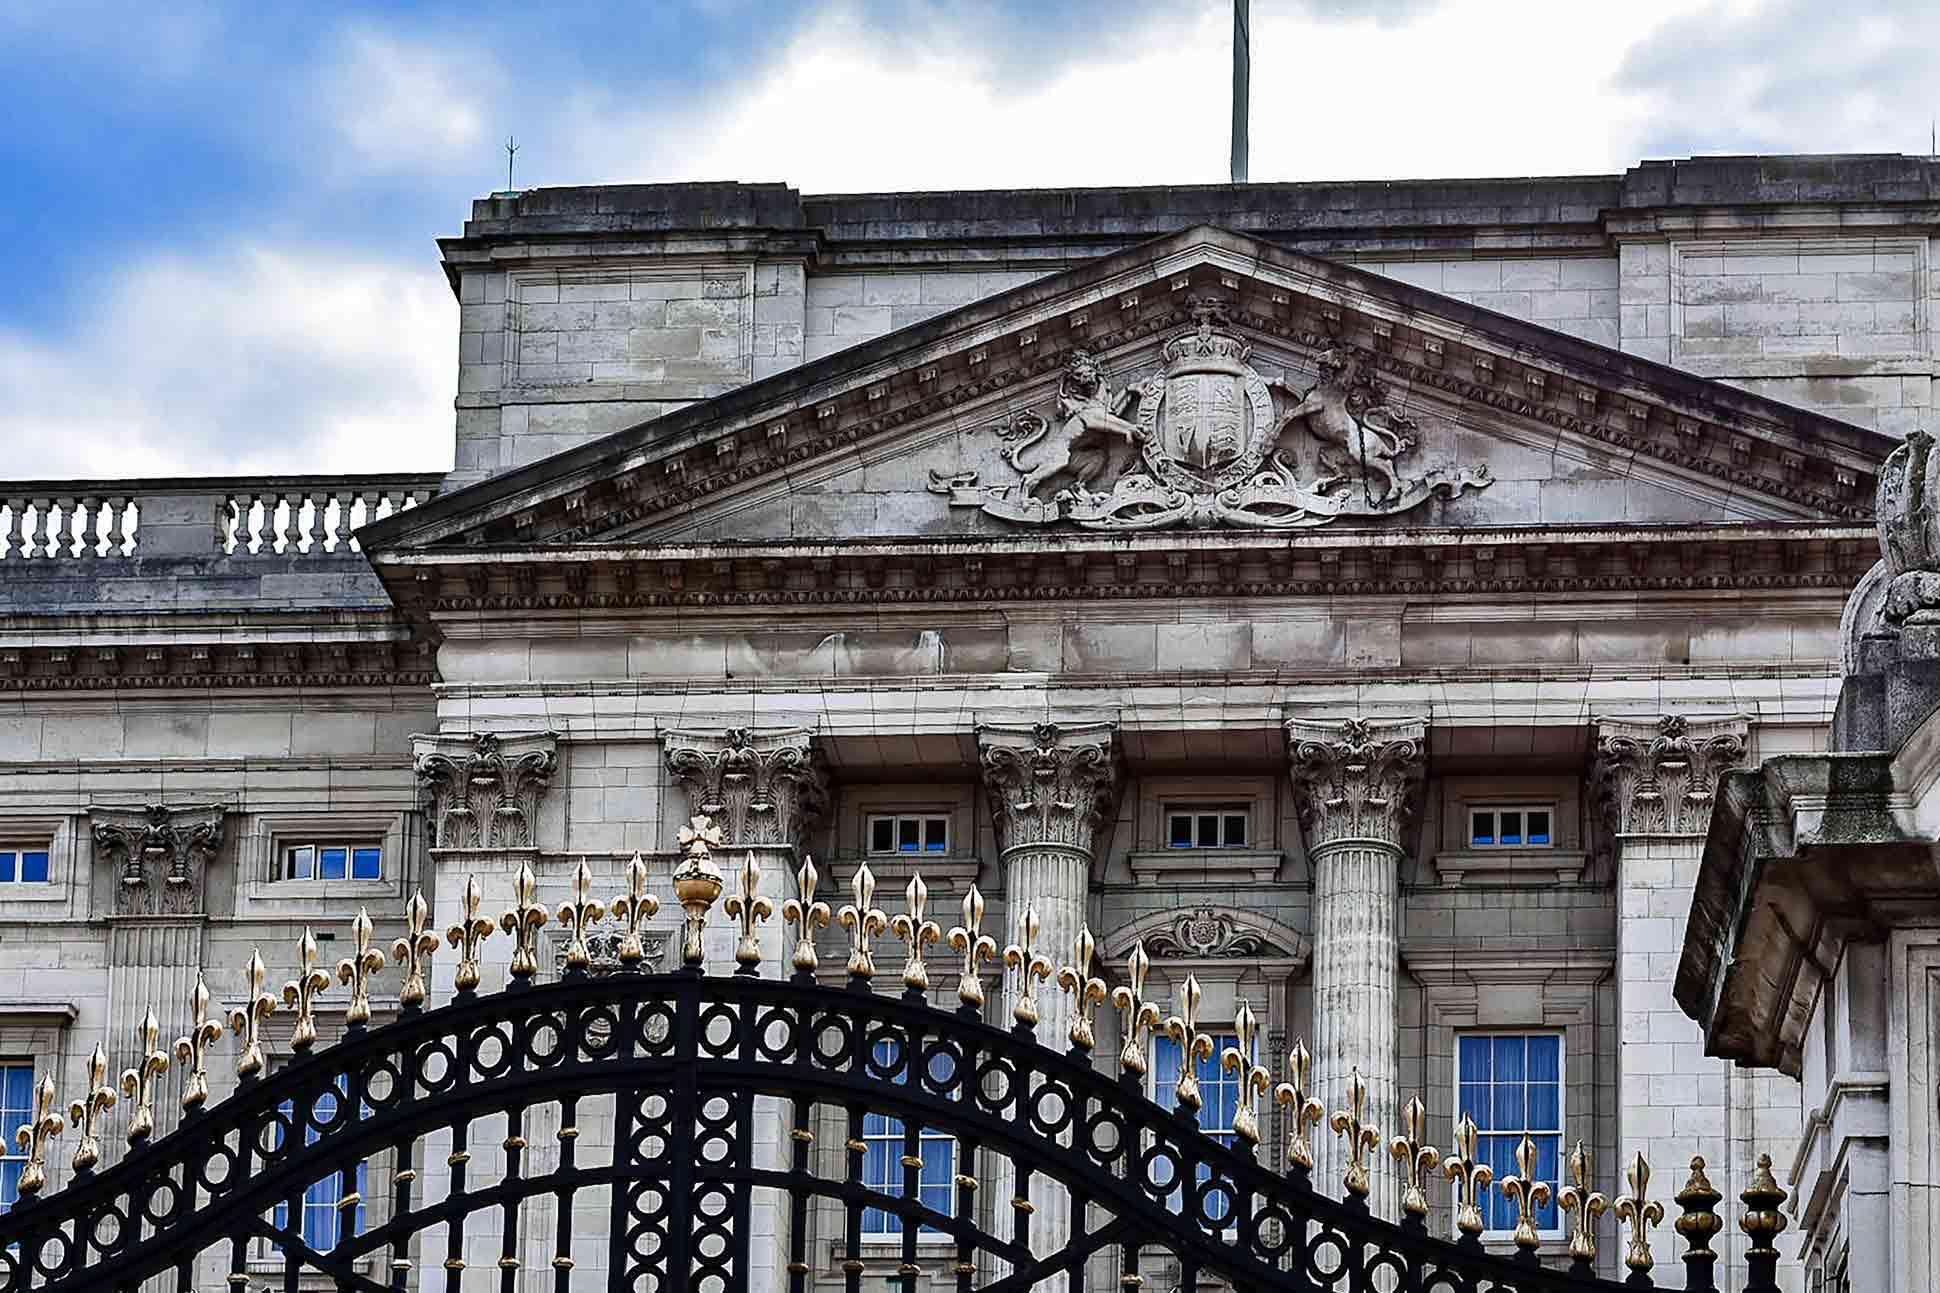 Royal Collection Trust: <br> The Queen's Garden